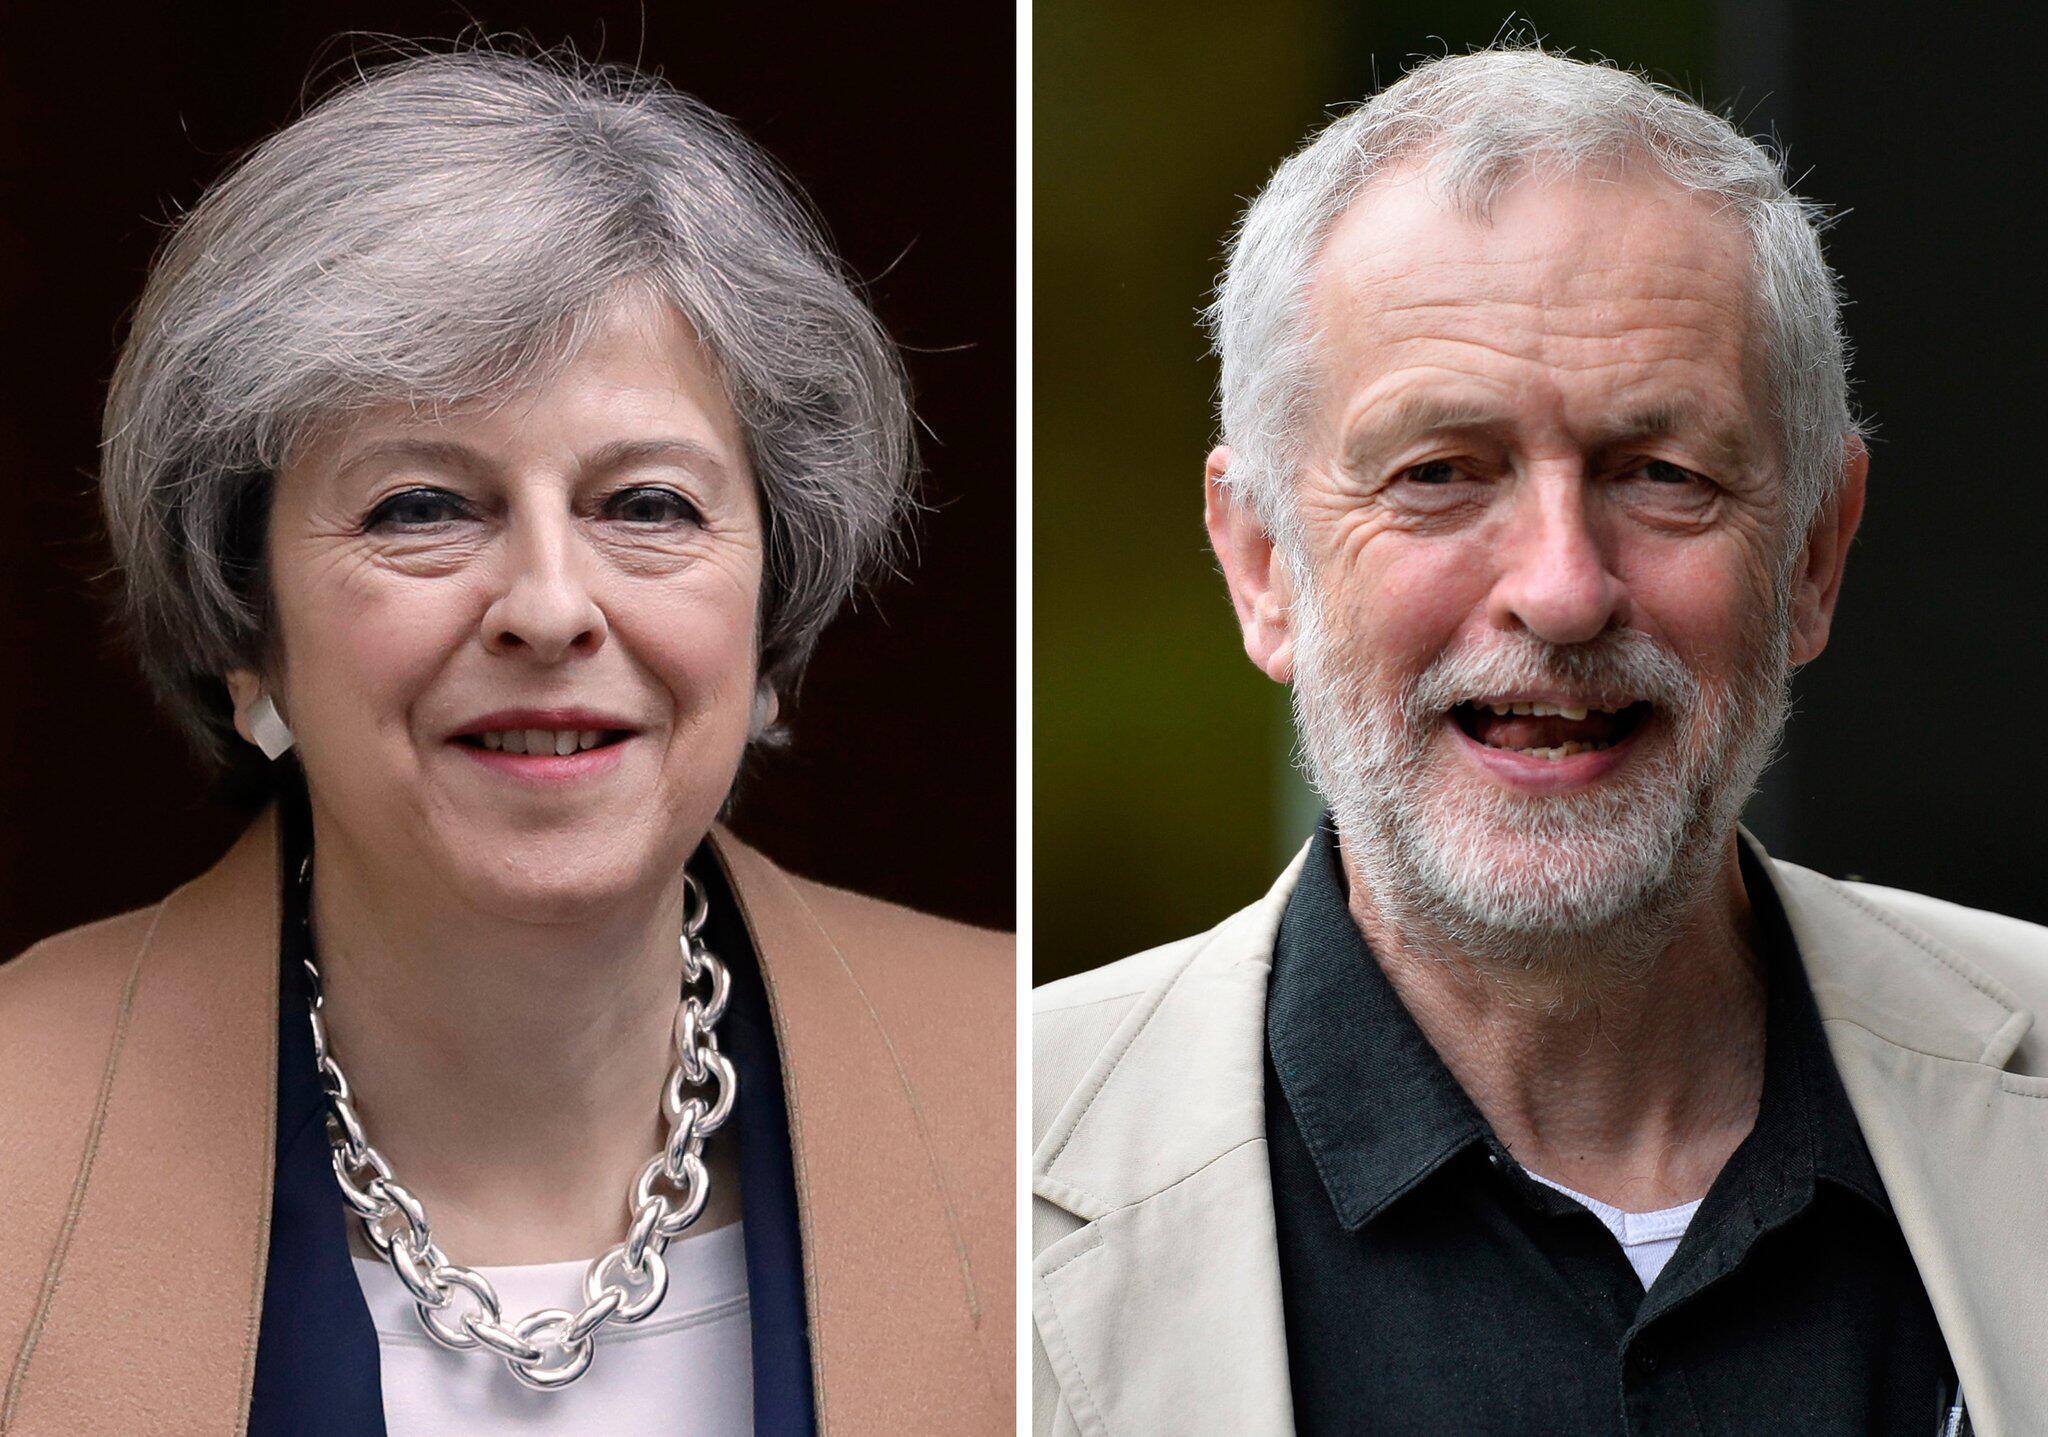 Bild zu Theresa May und Jeremy Corbyn